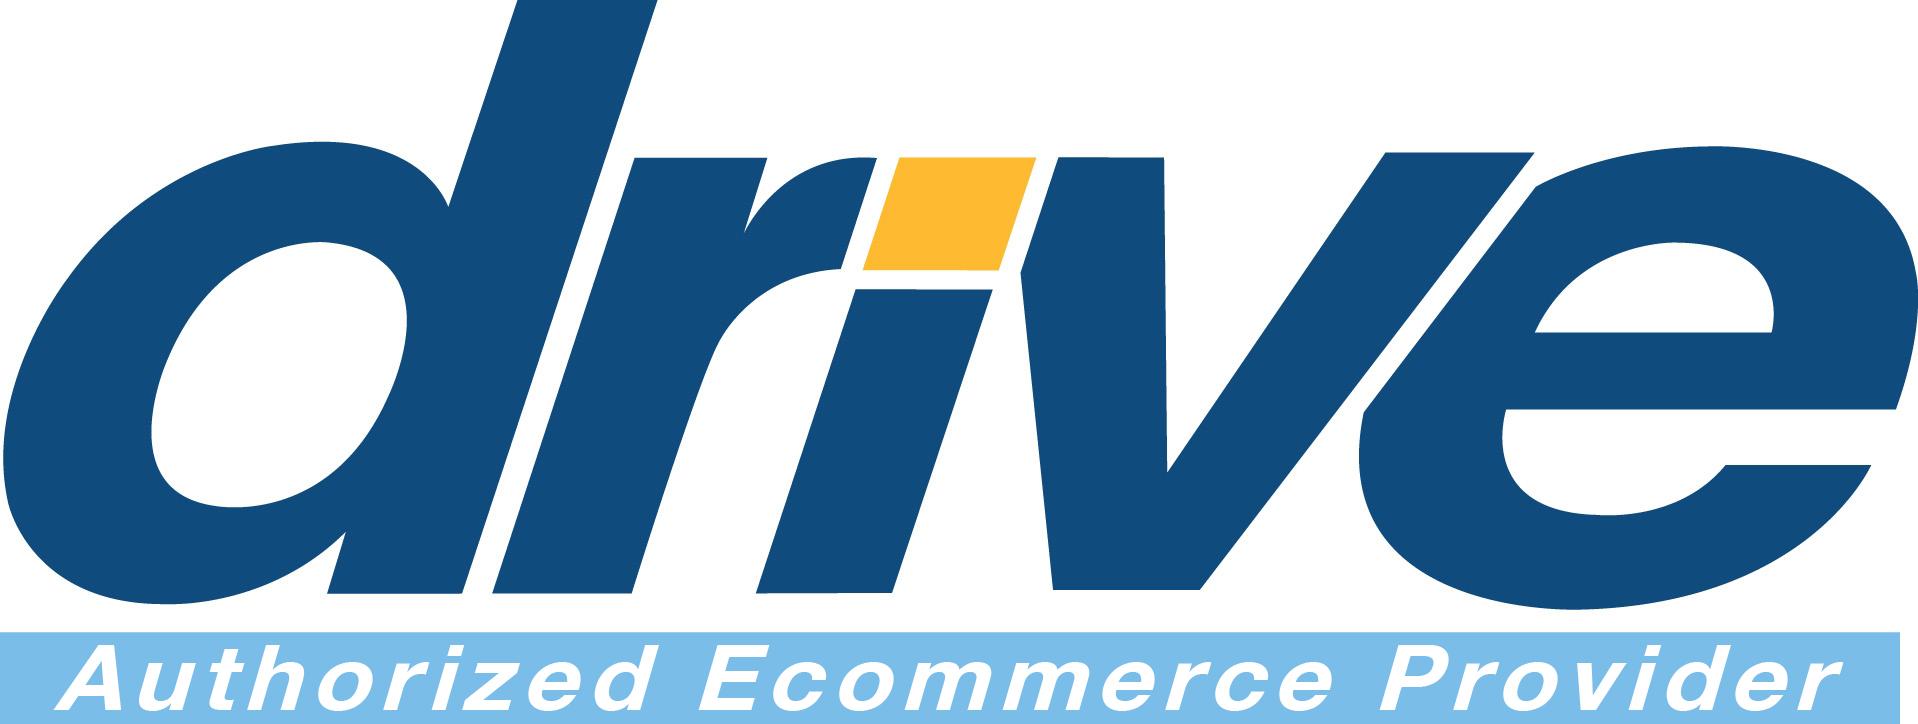 drive-authorized-drive-medical-ecommerce-retailer-logo-1-.jpg